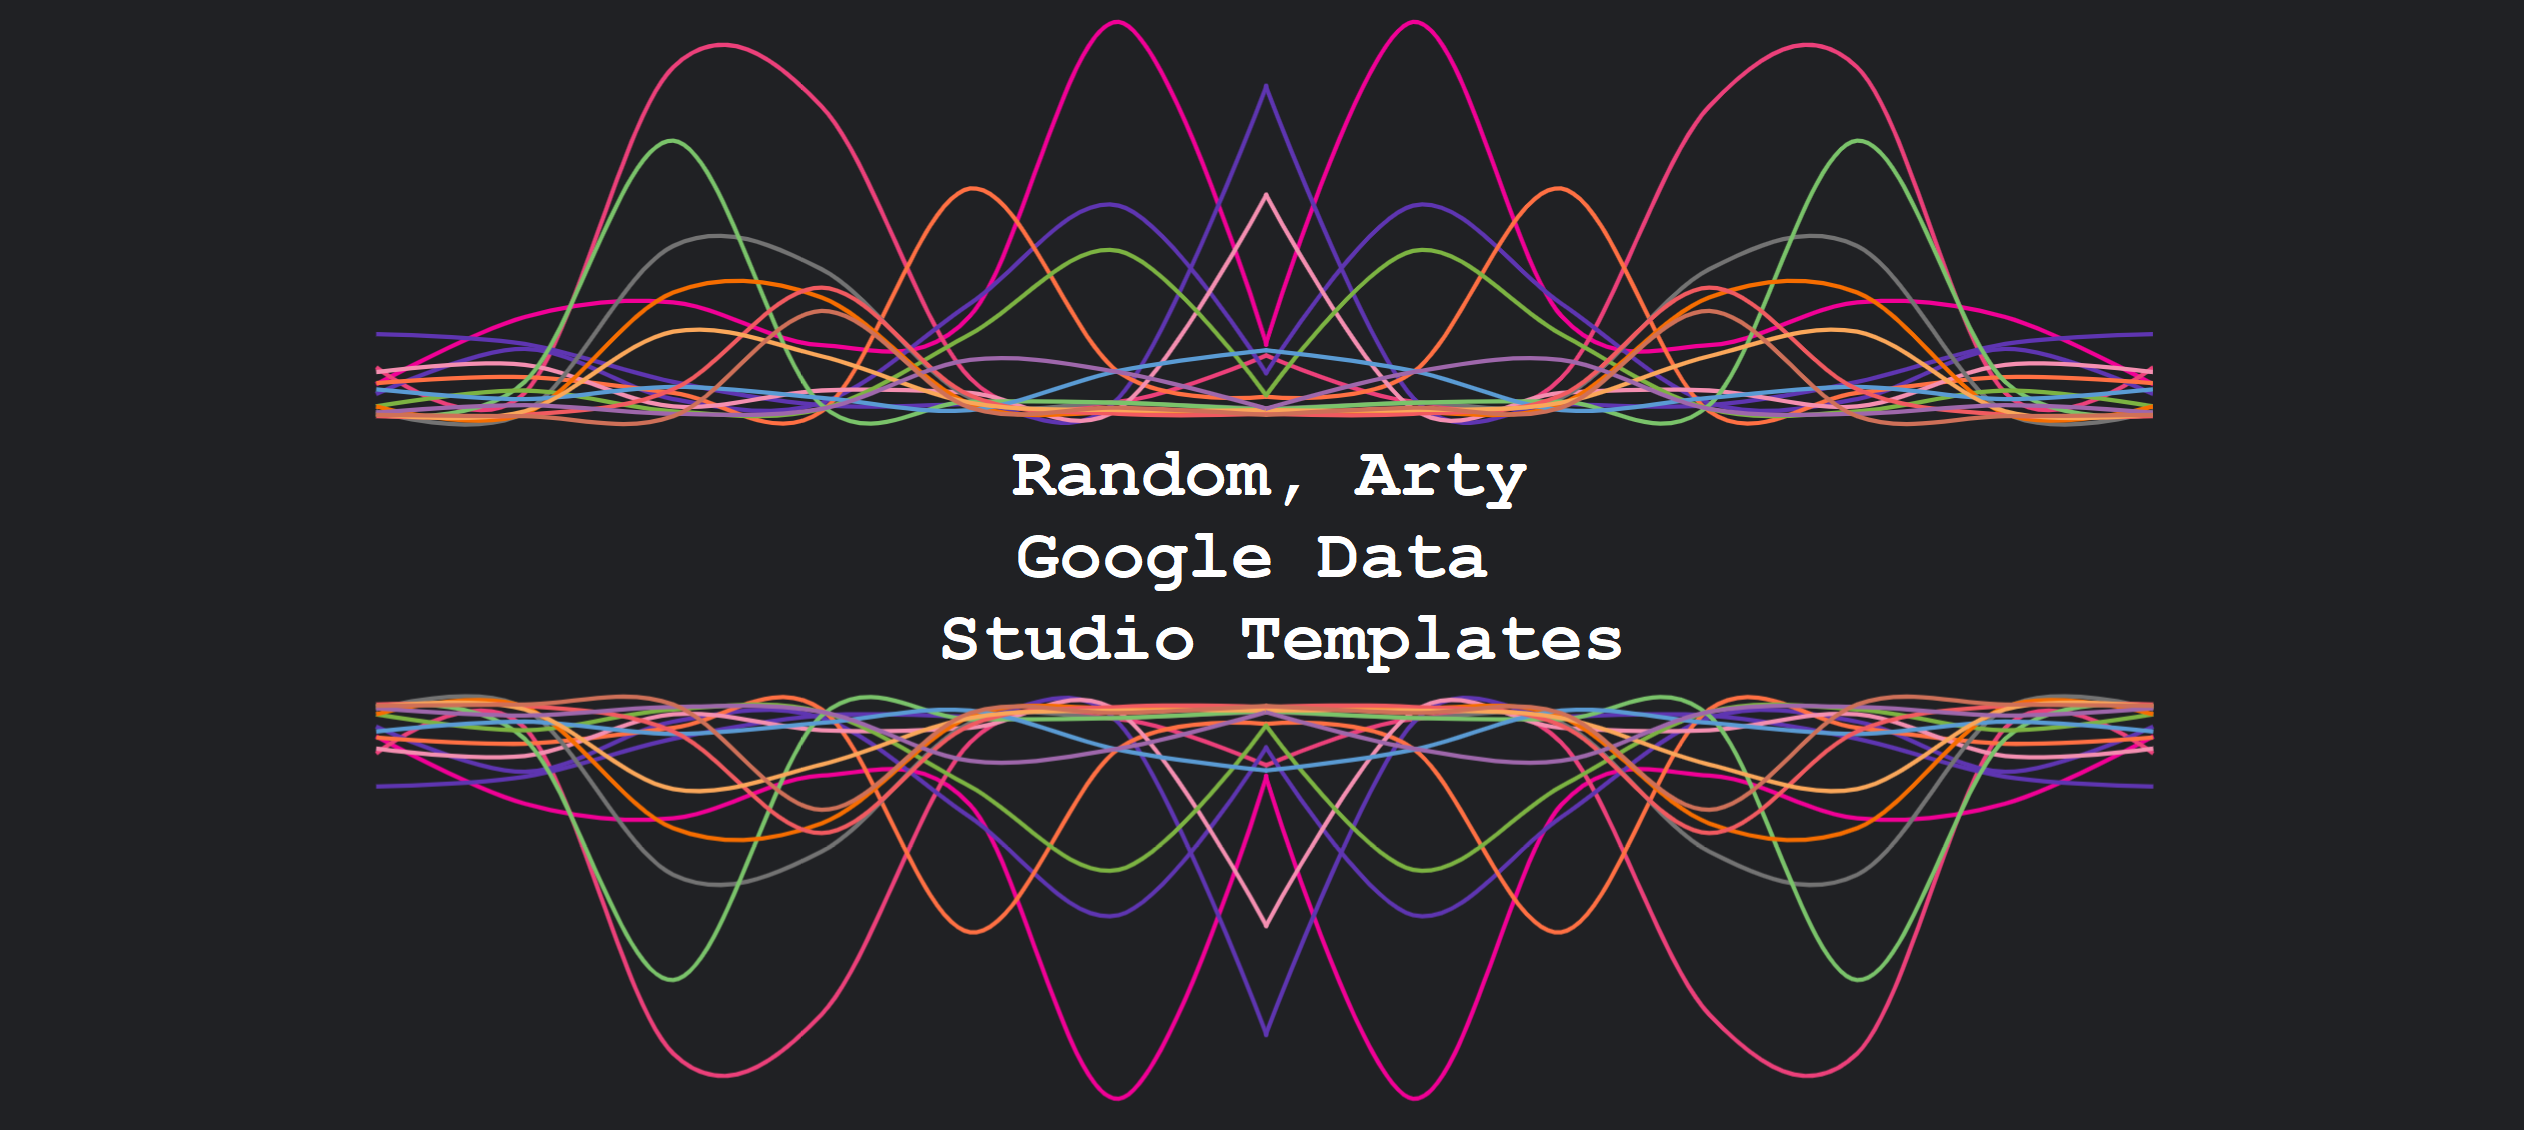 GDS Random, Arty Google Data Studio Templates